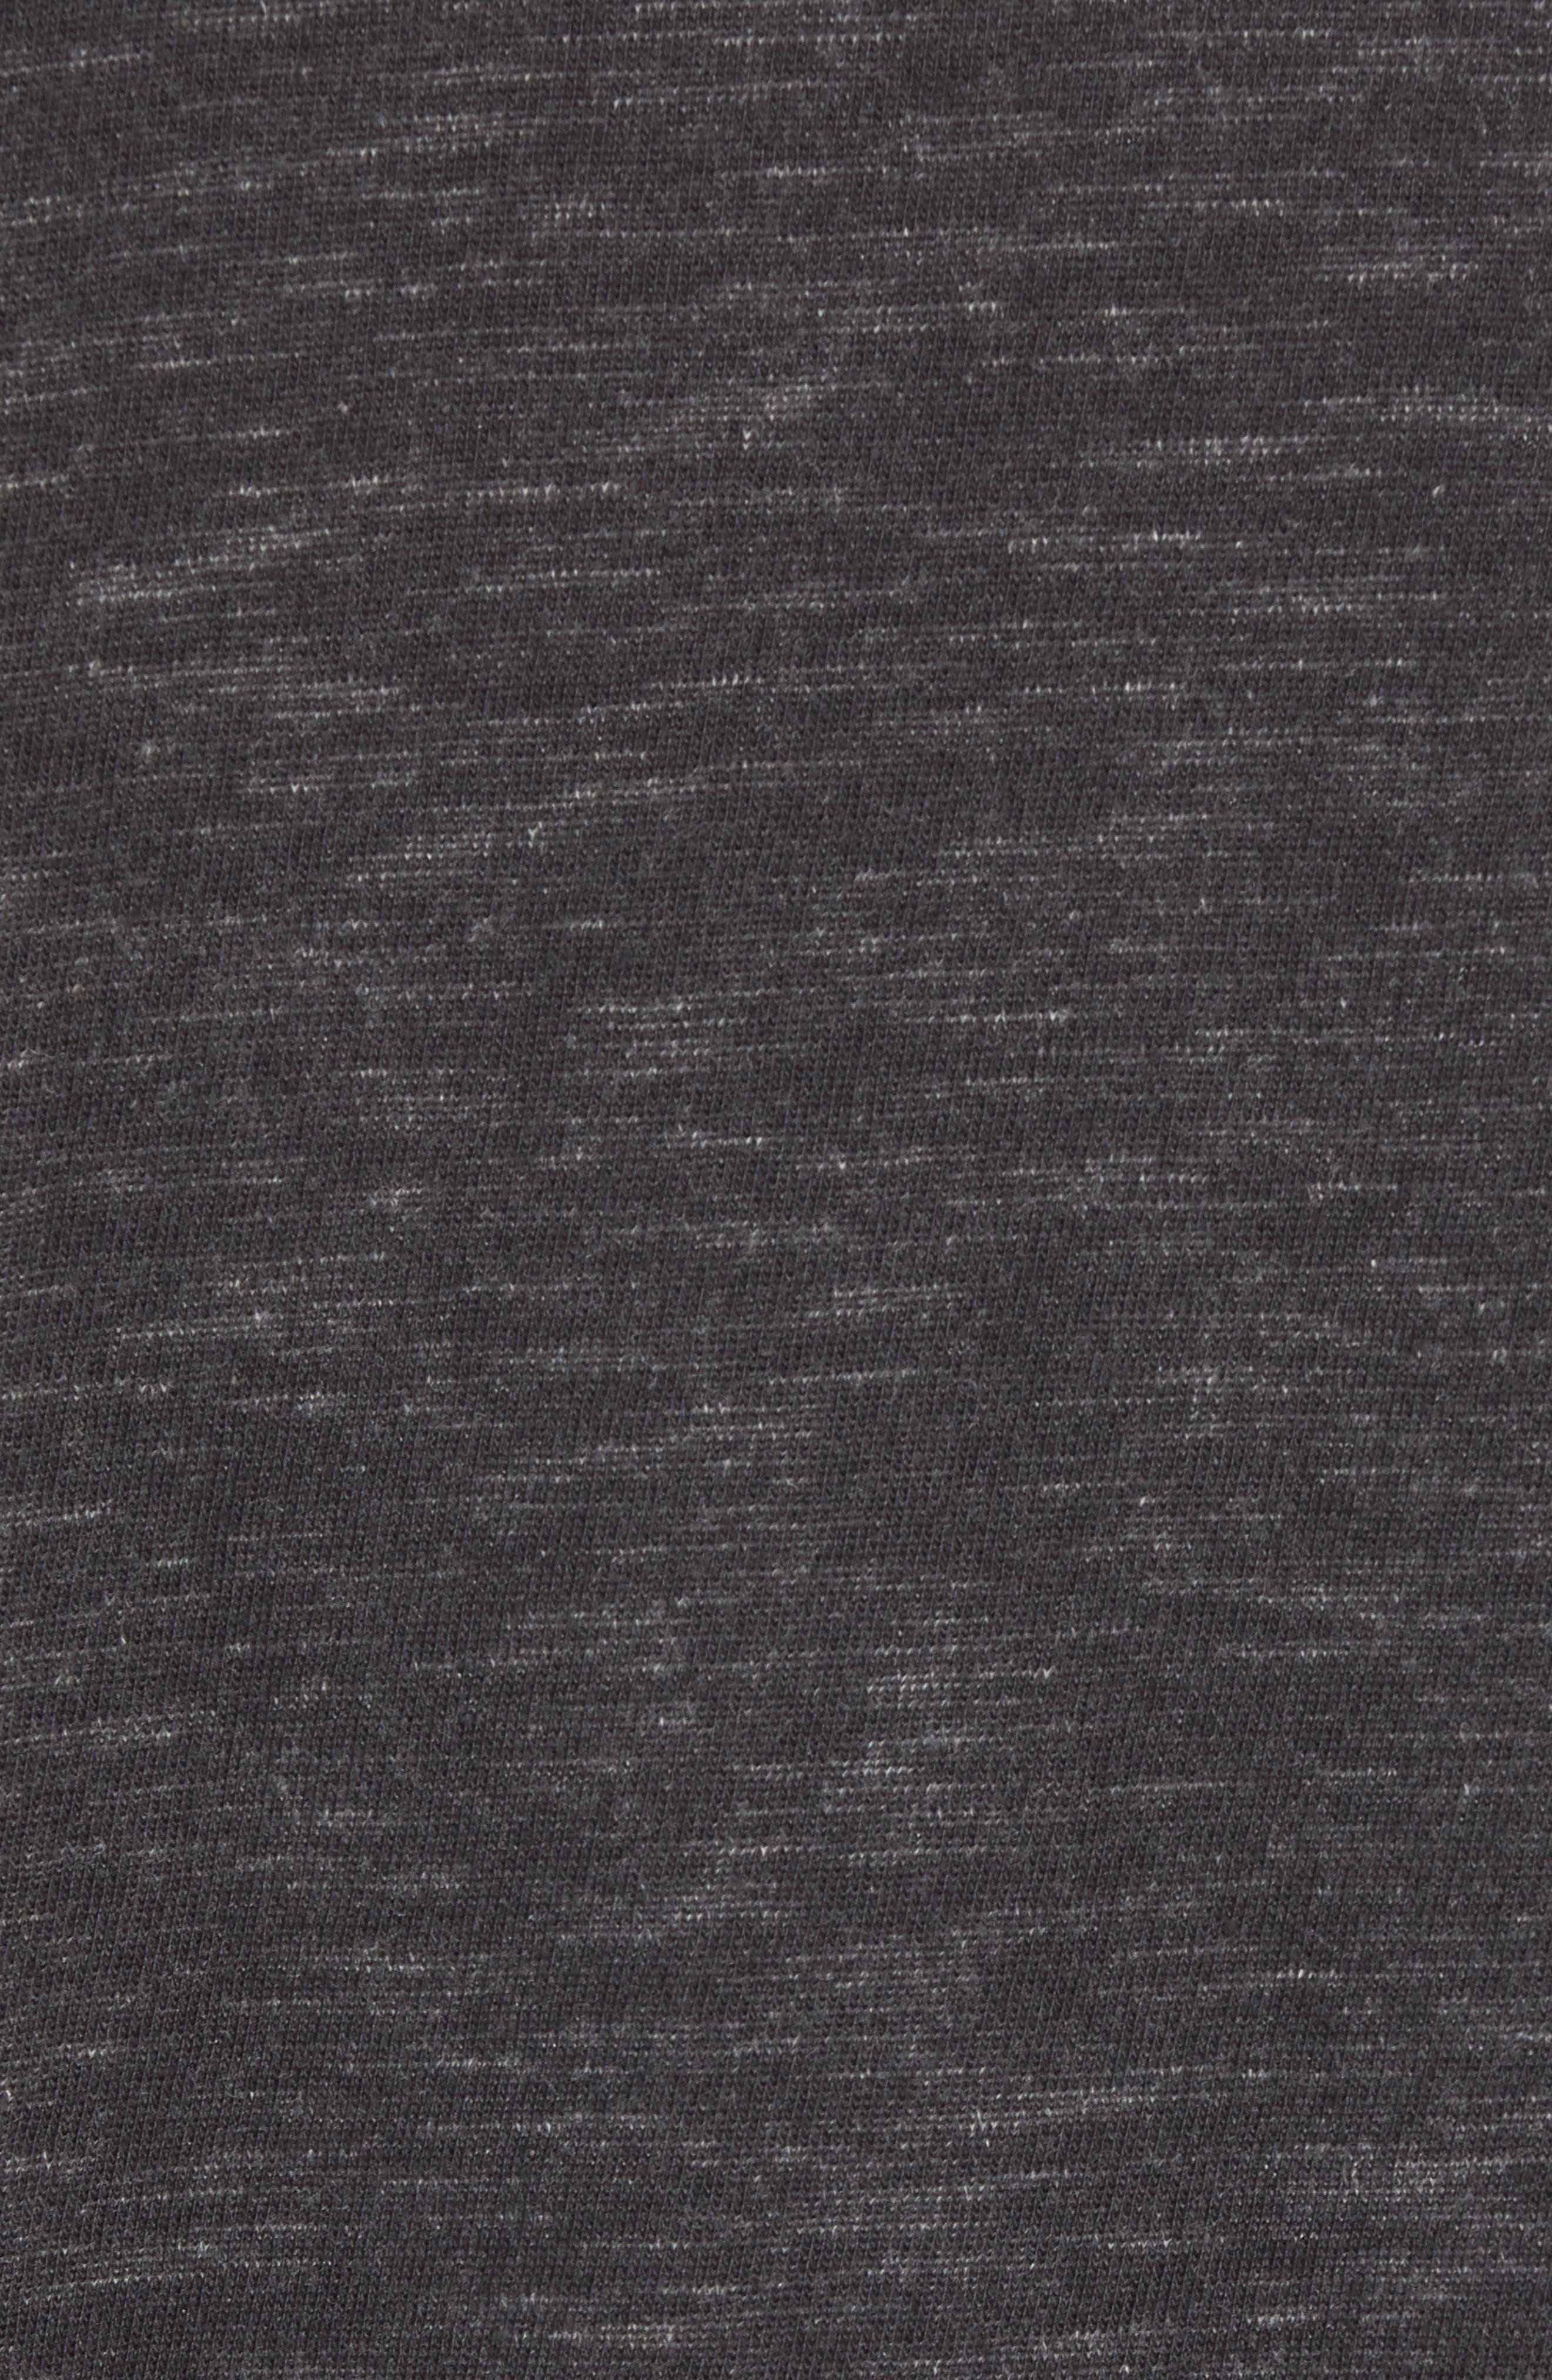 Antonia Abaco Shirt,                             Alternate thumbnail 5, color,                             001